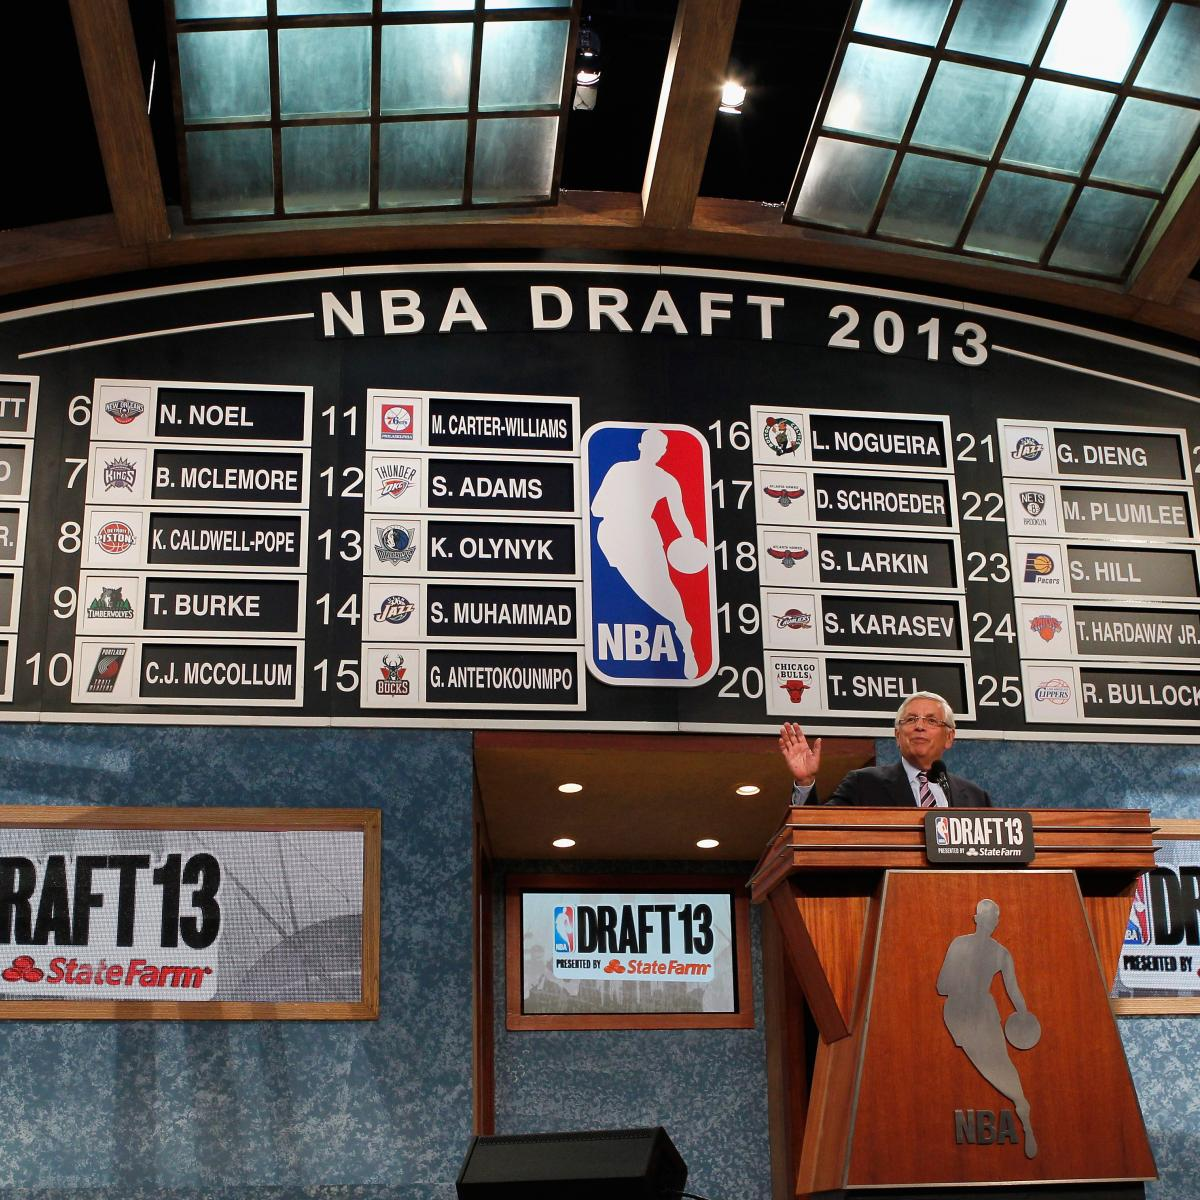 NBA Draft 2013: Ranking the Best and Worst Picks ...